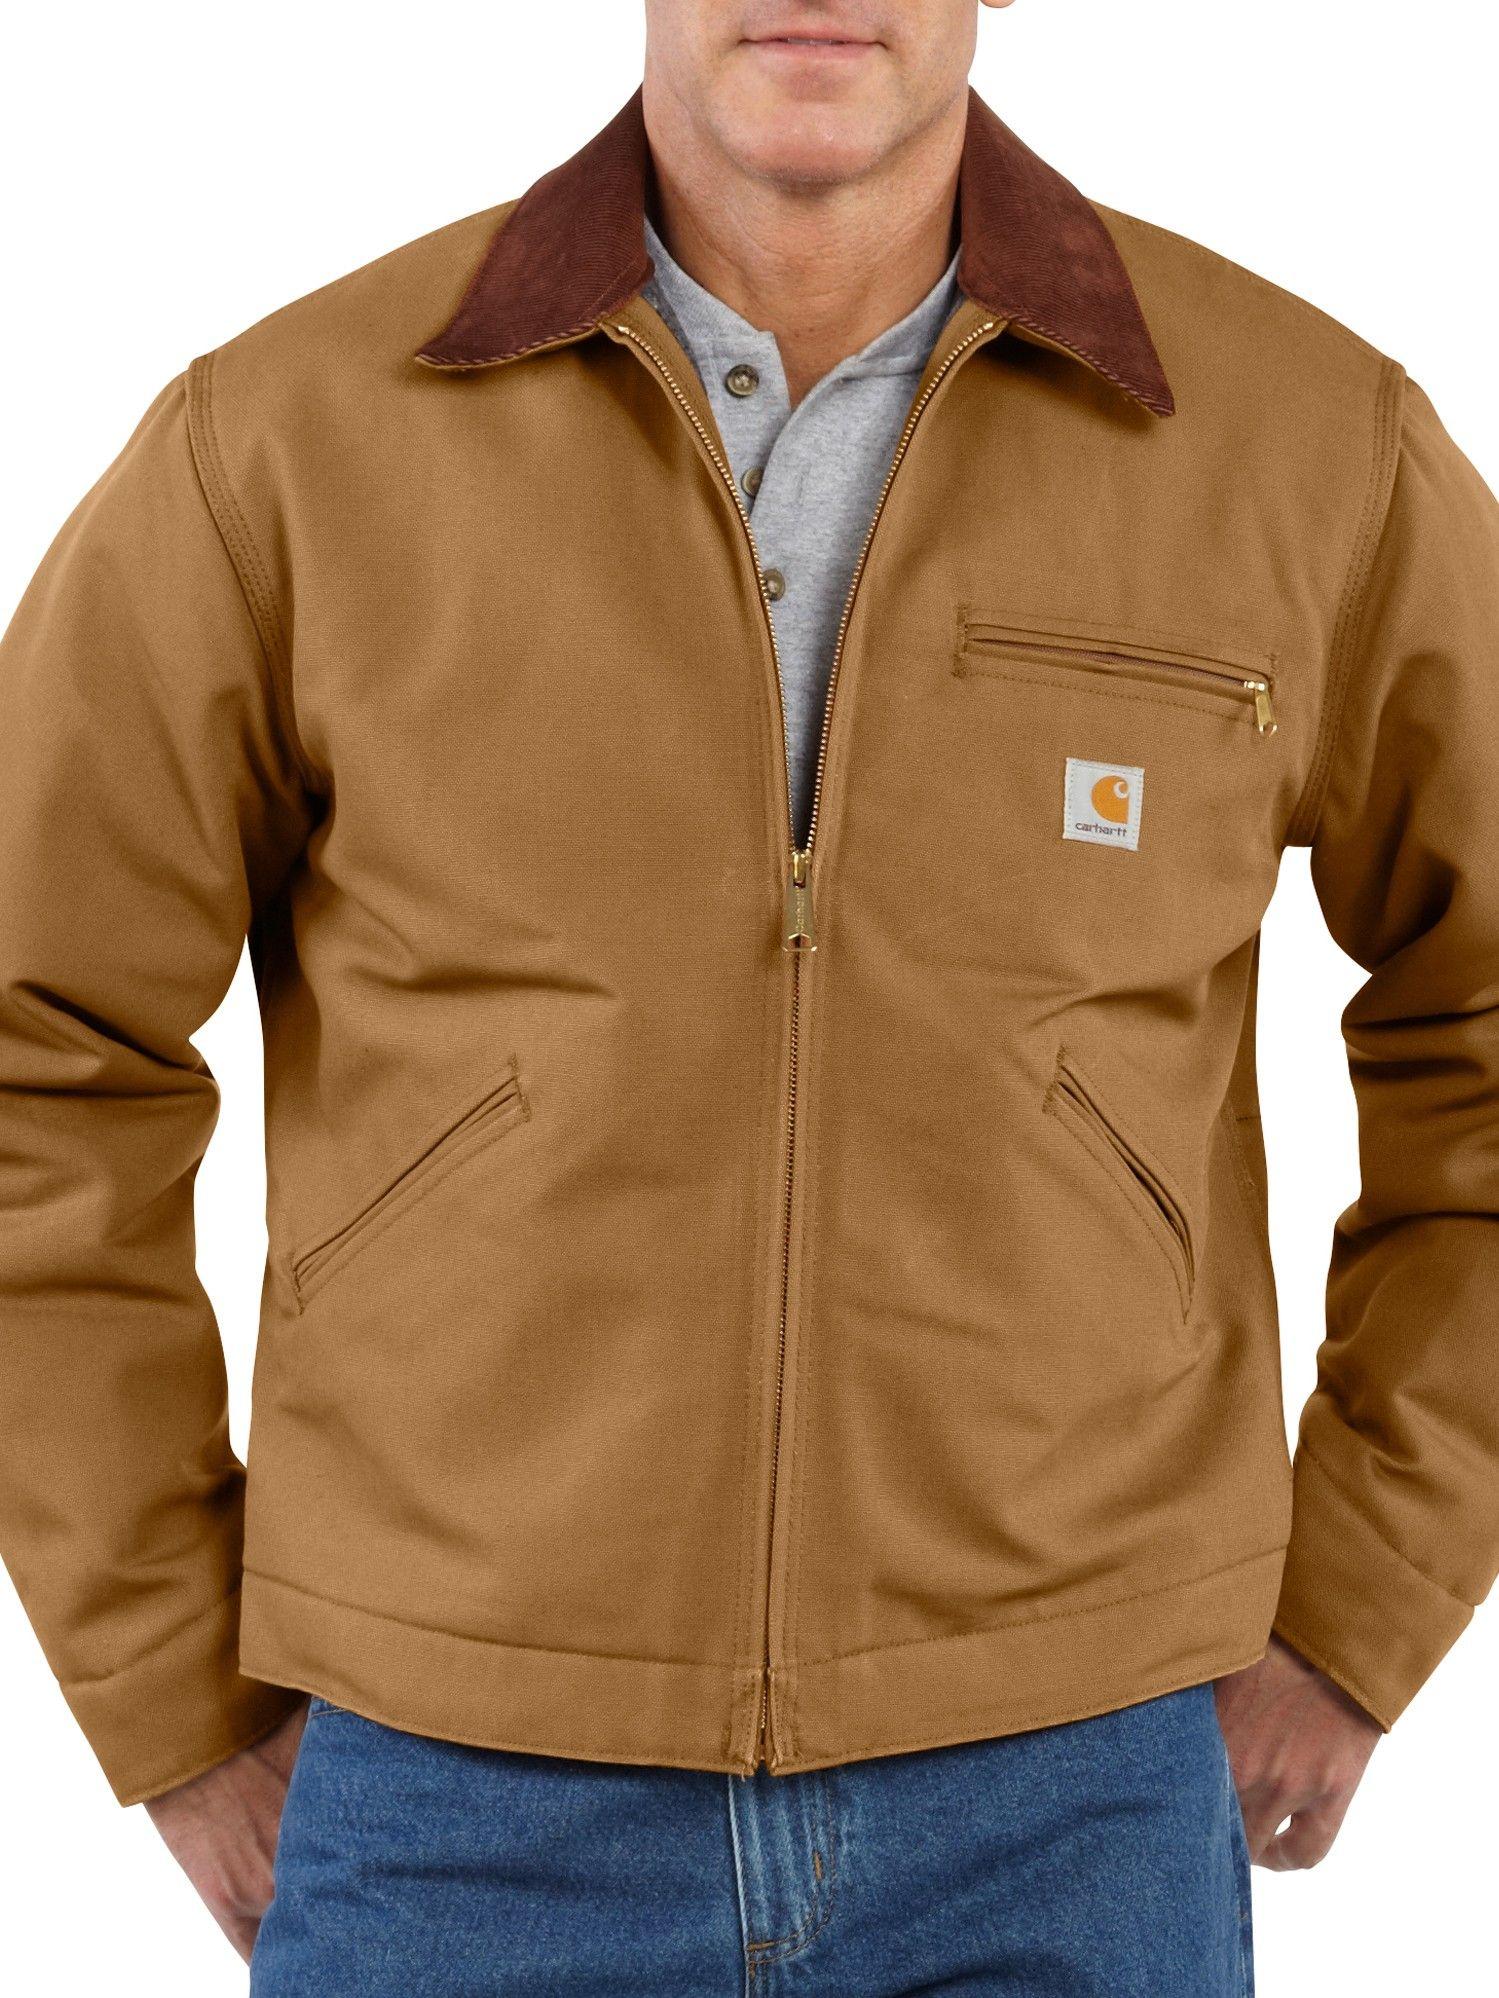 Pin Na Doske Men S Outerwear Coats Jackets [ 1998 x 1499 Pixel ]